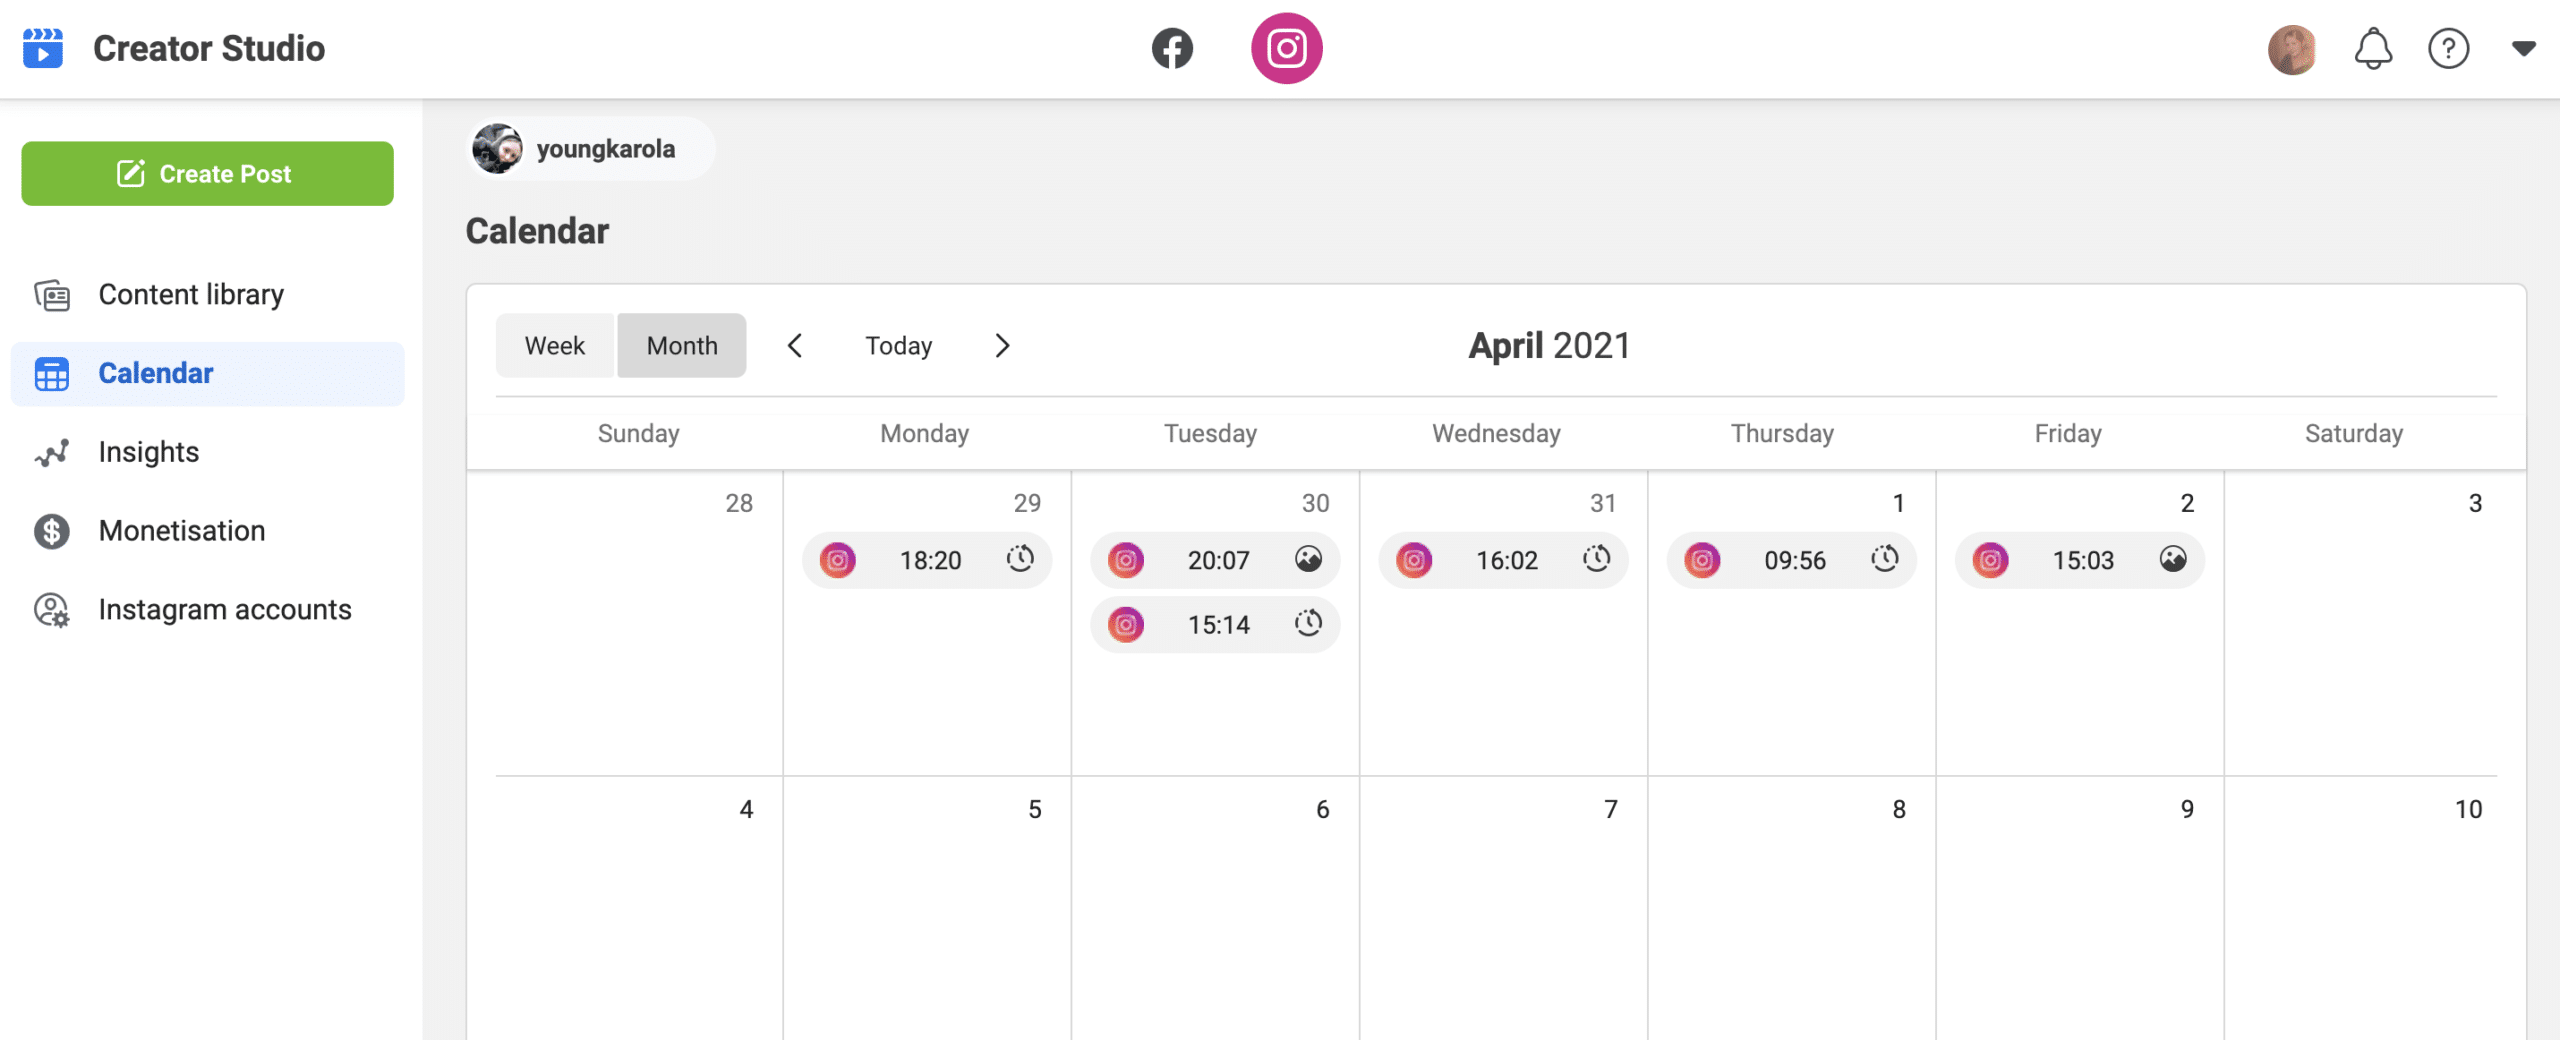 Календарь Instagram Creator Studio